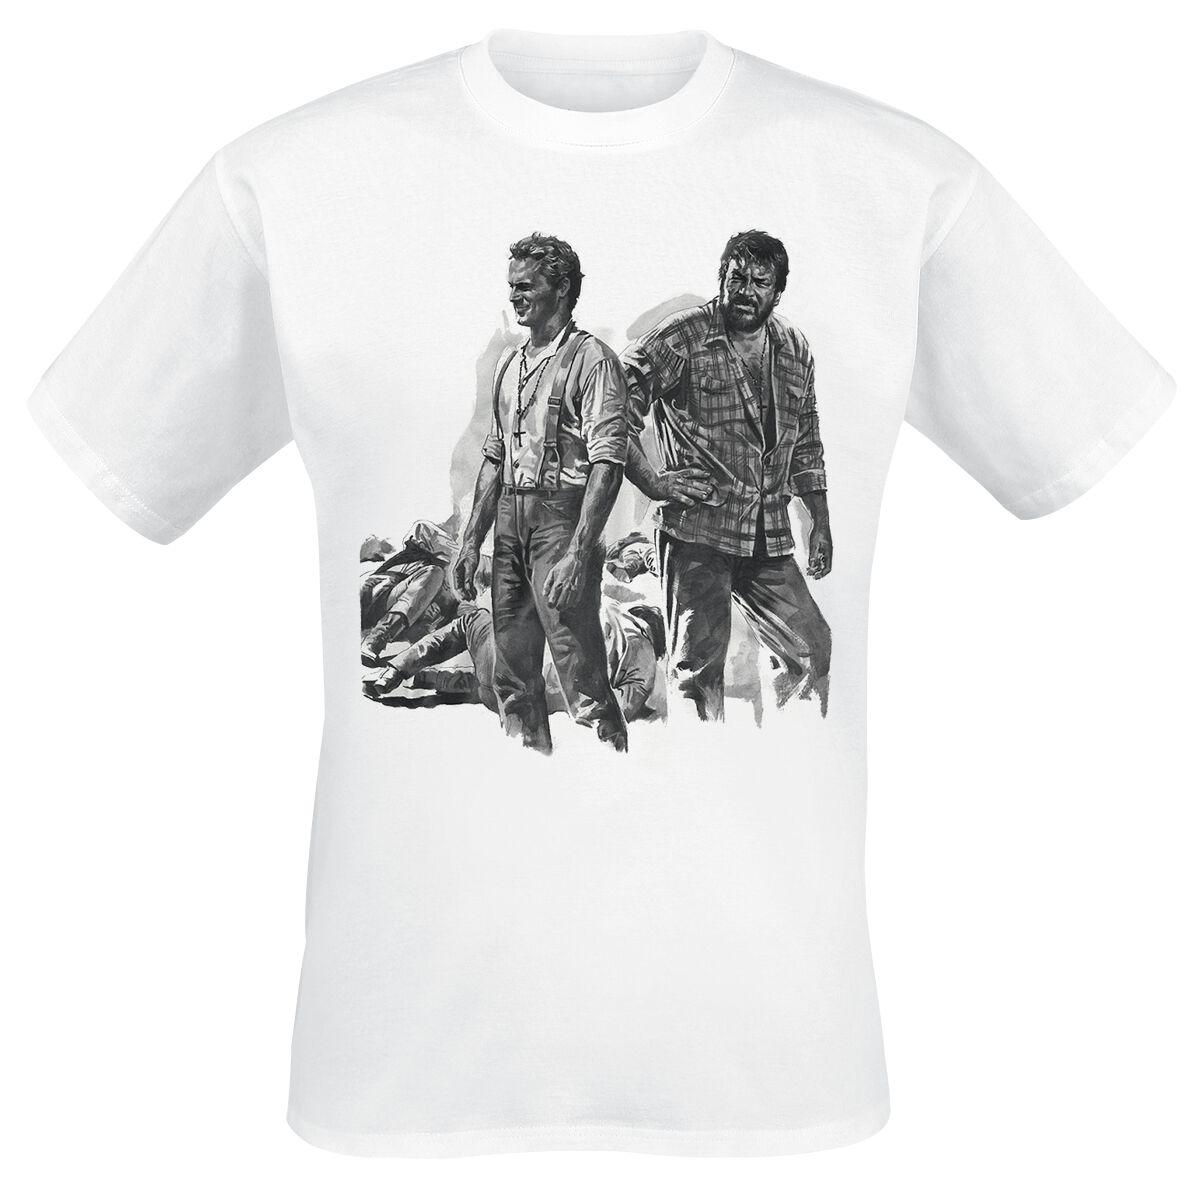 Merch dla Fanów - Koszulki - T-Shirt Bud Spencer Zwei Himmelhunde auf dem Weg zur Hölle T-Shirt biały - 353366